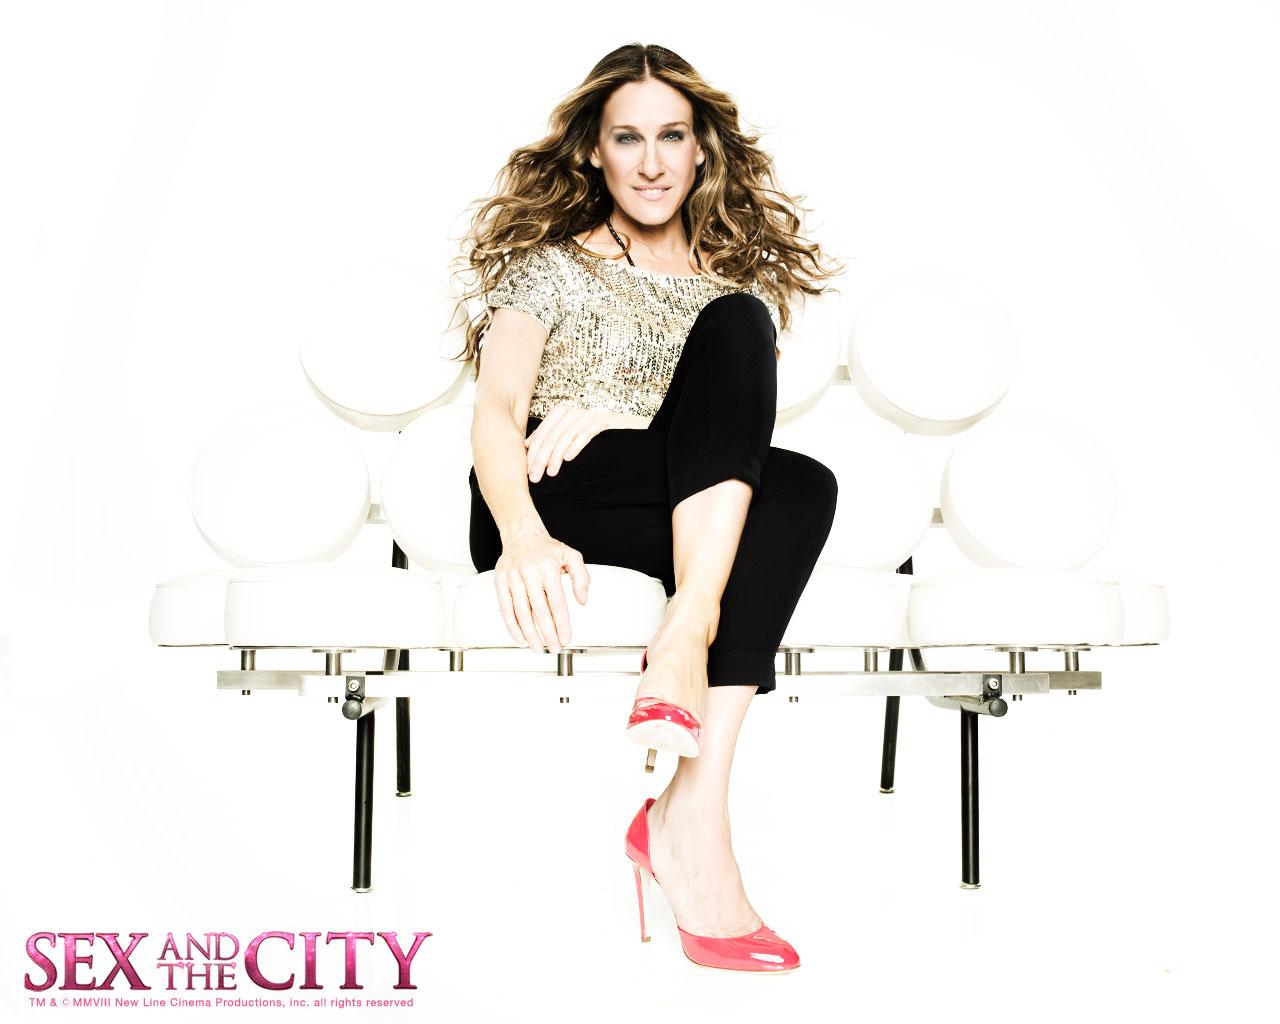 http://3.bp.blogspot.com/__MUF9Ou3FQk/TU4CZgxepwI/AAAAAAAAAYY/S0YWifwVrp4/s1600/Sex-and-the-City-The-Movie.jpg